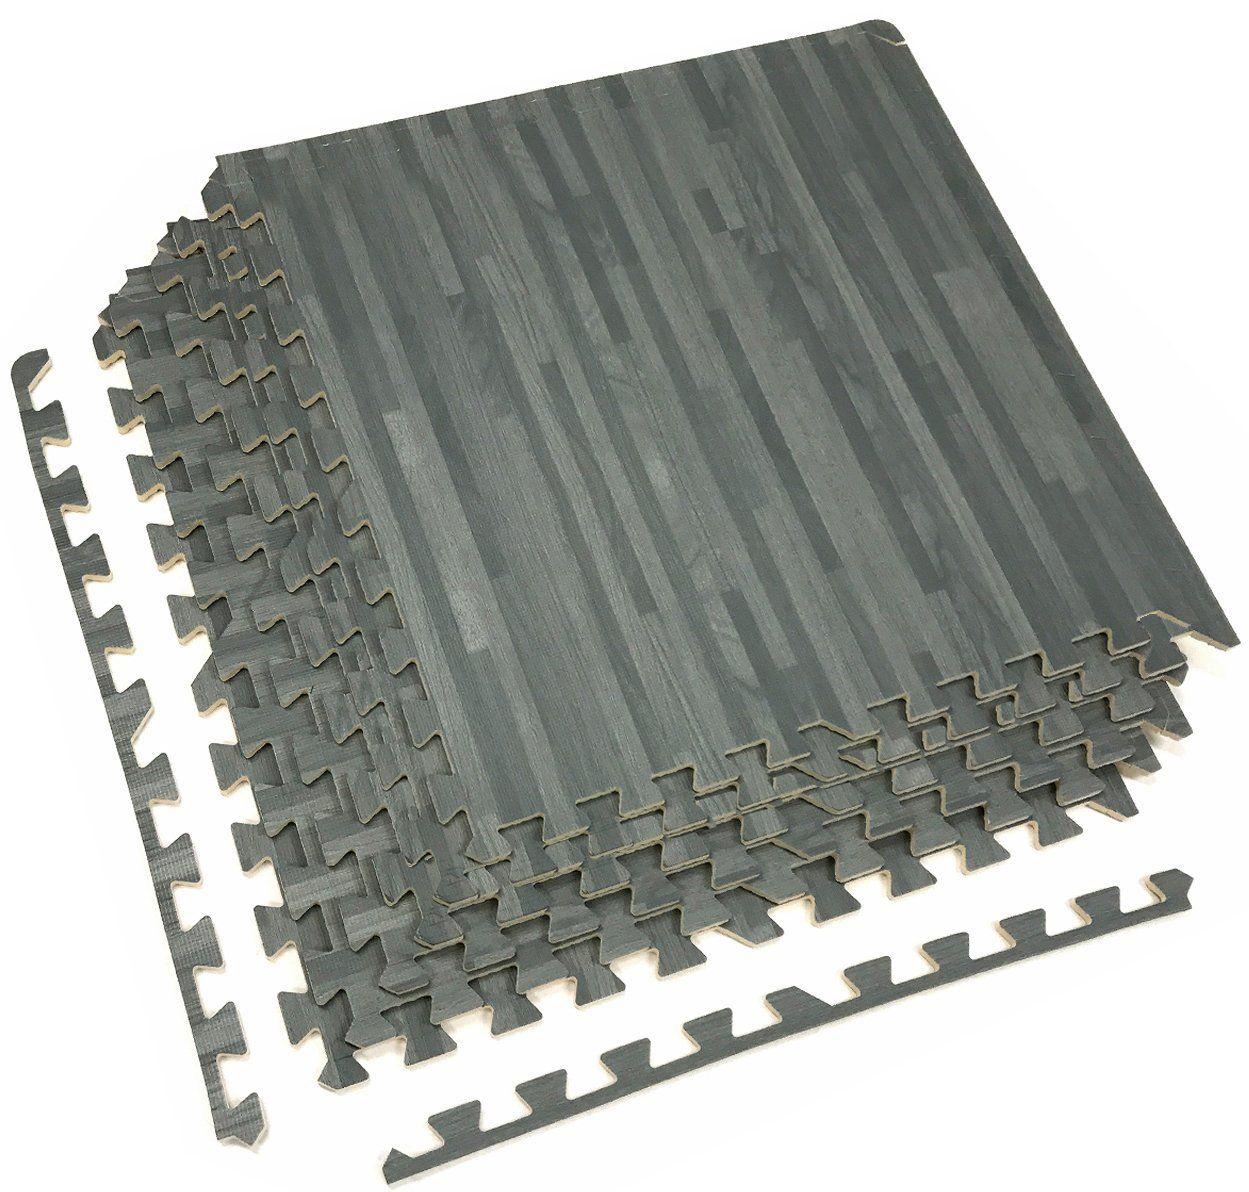 Sorbus Wood Grain Floor Mat 3 8 Inch Thick Foam Interlocking Flooring Tiles With Borders For H Interlocking Flooring Foam Floor Tiles Interlocking Floor Mats